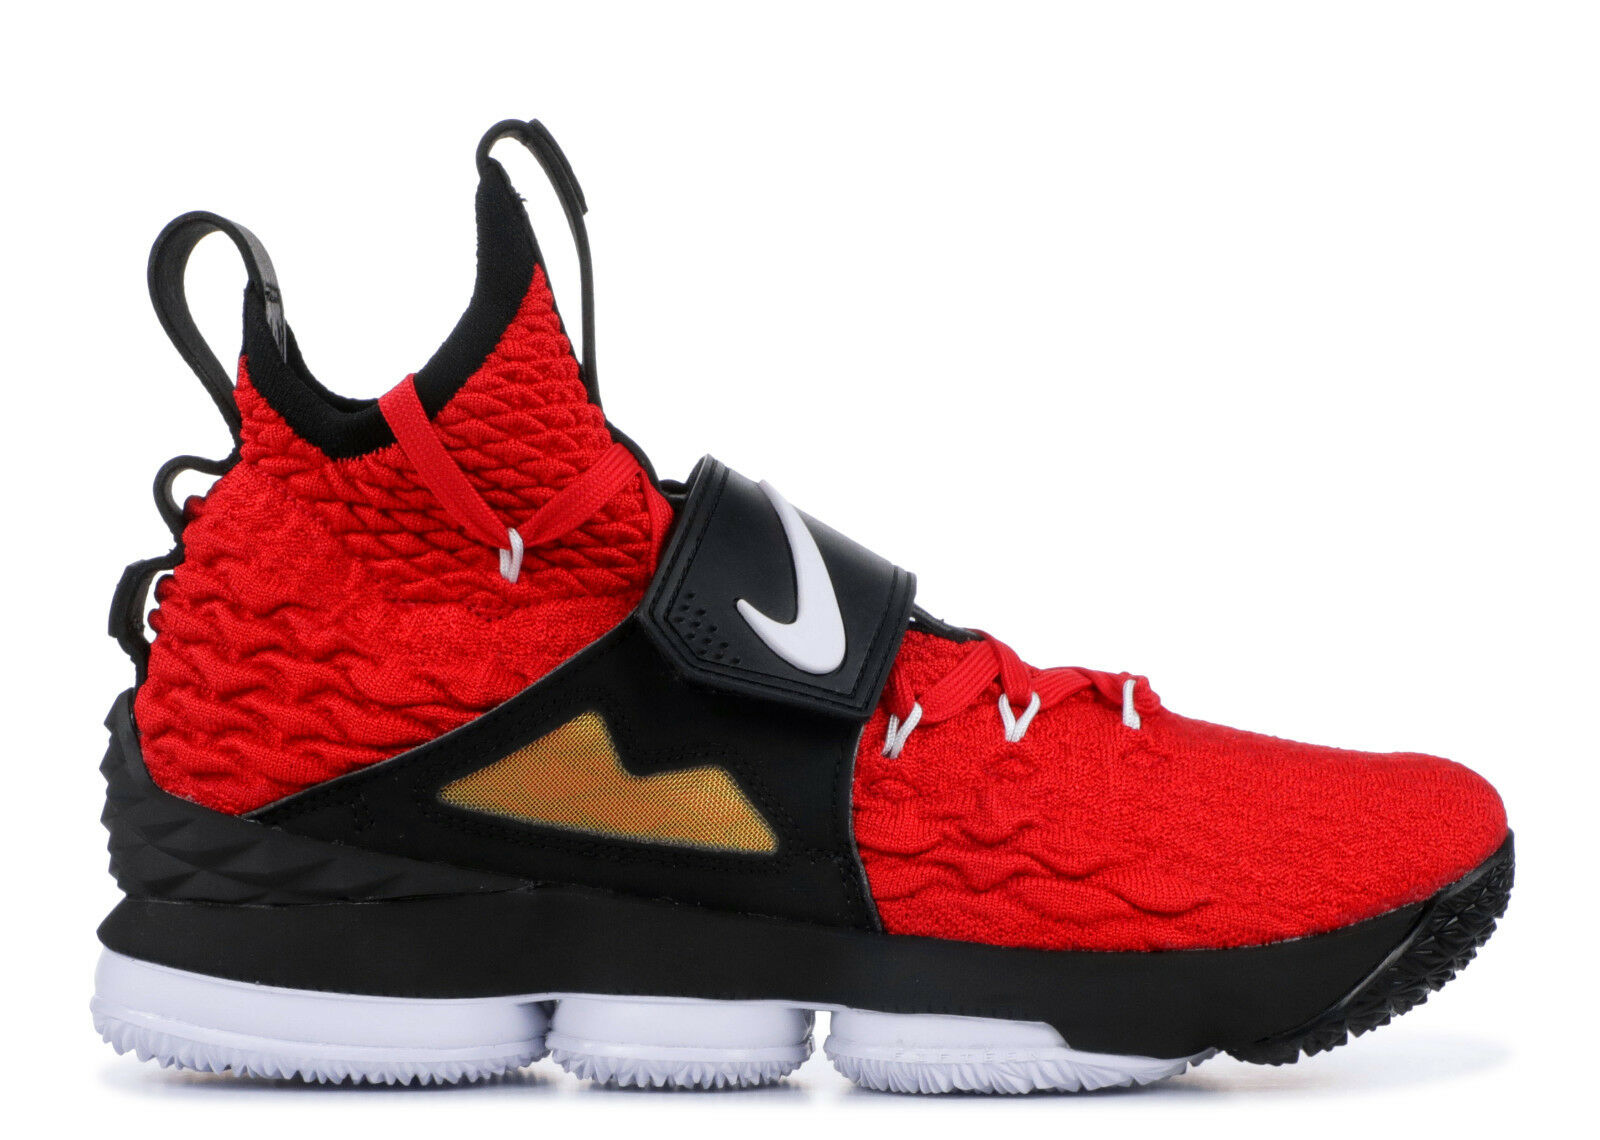 Nike Nike Nike lebron 15 xv ROT diamond revier prime deion sanders 14.ao9144-600 611fc9